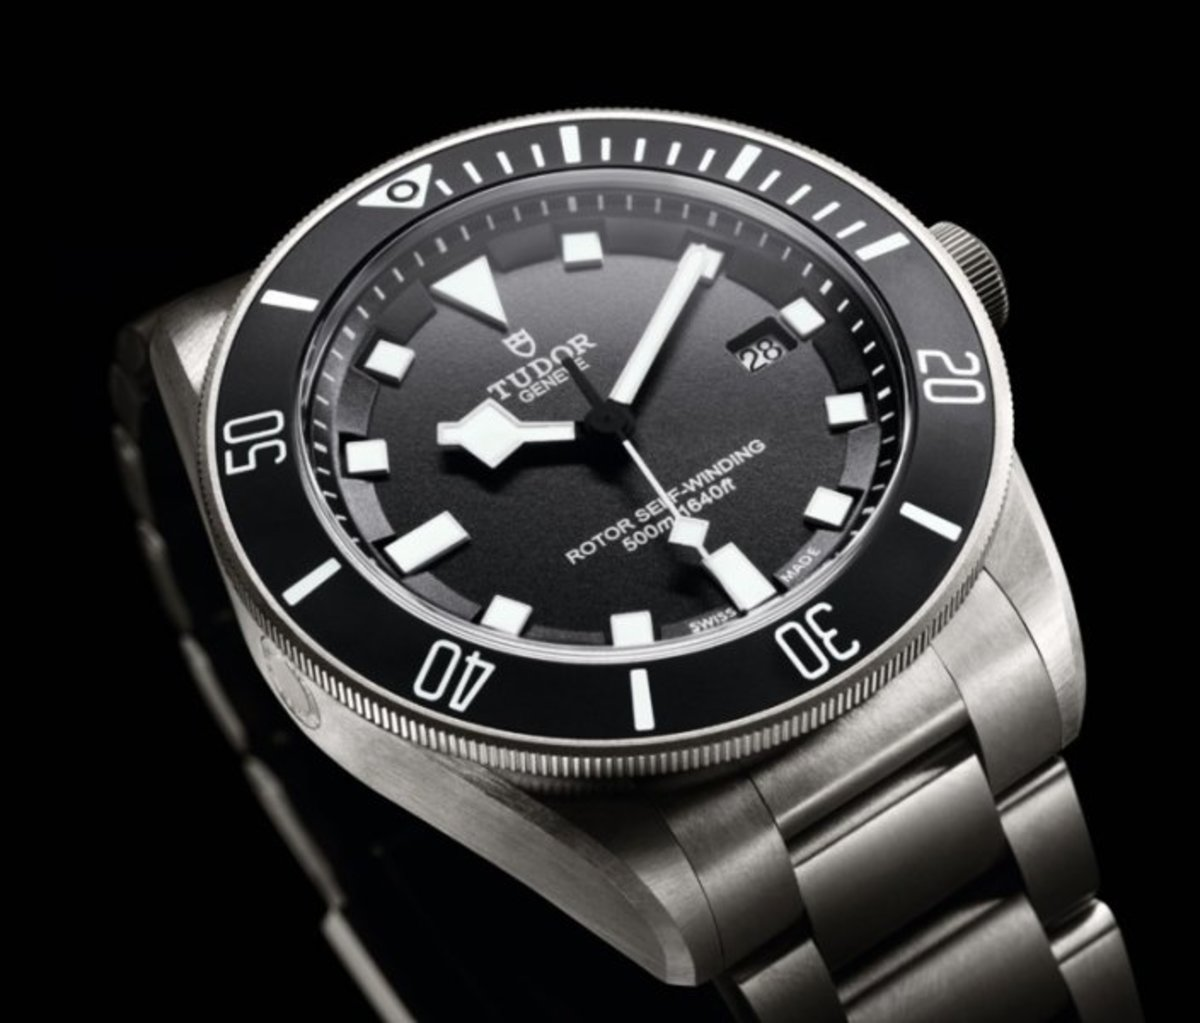 5728_BASELWORLD-2012-TUDOR-Pelagos-A-superlative-watch_0